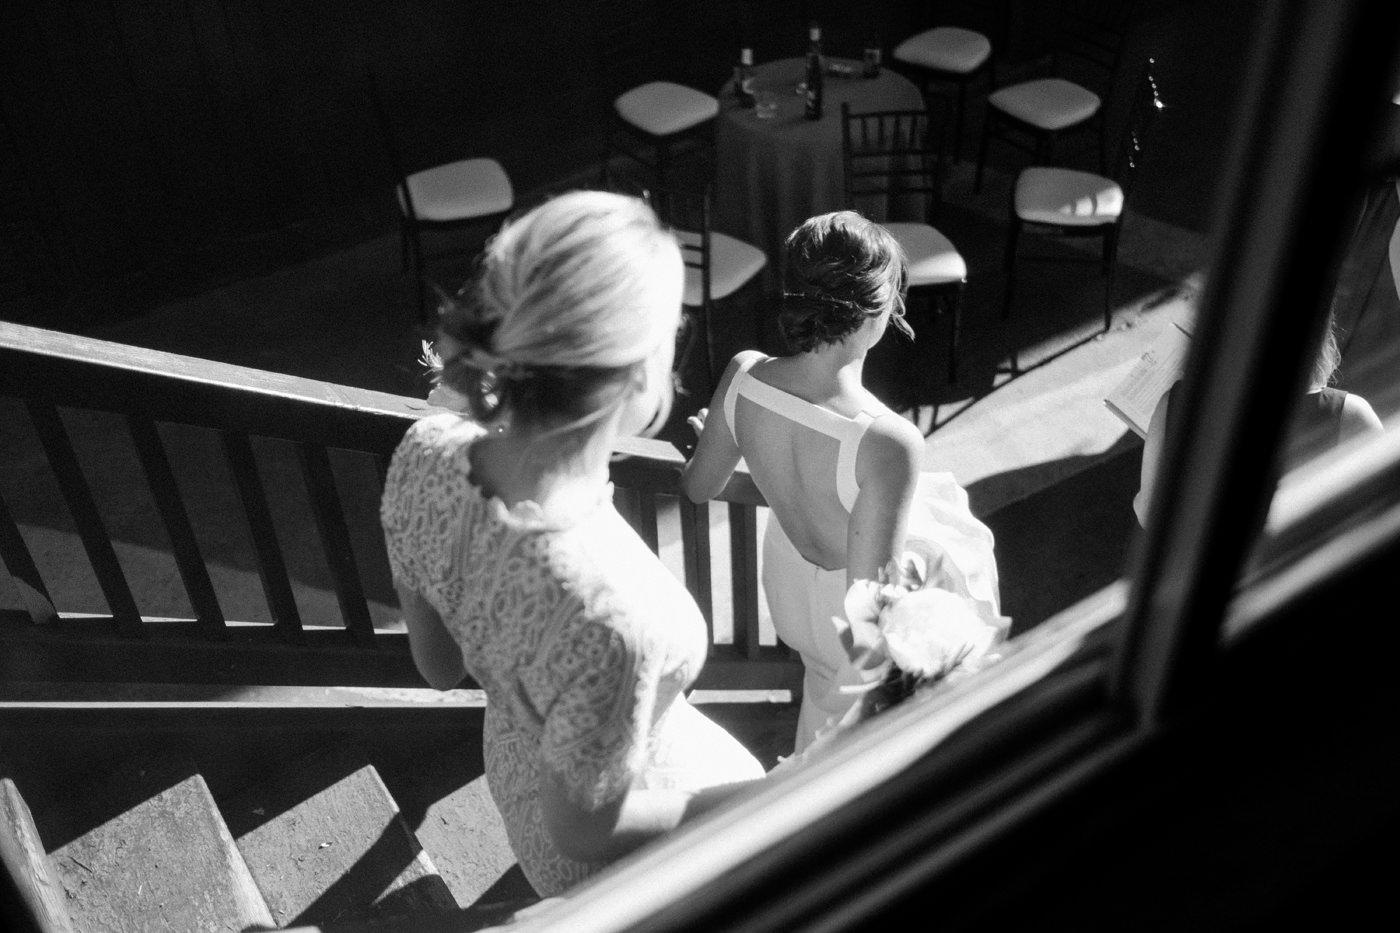 030-documentary--style-indoor-wedding-photos-at-sodo-park-by-herban-feast.jpg